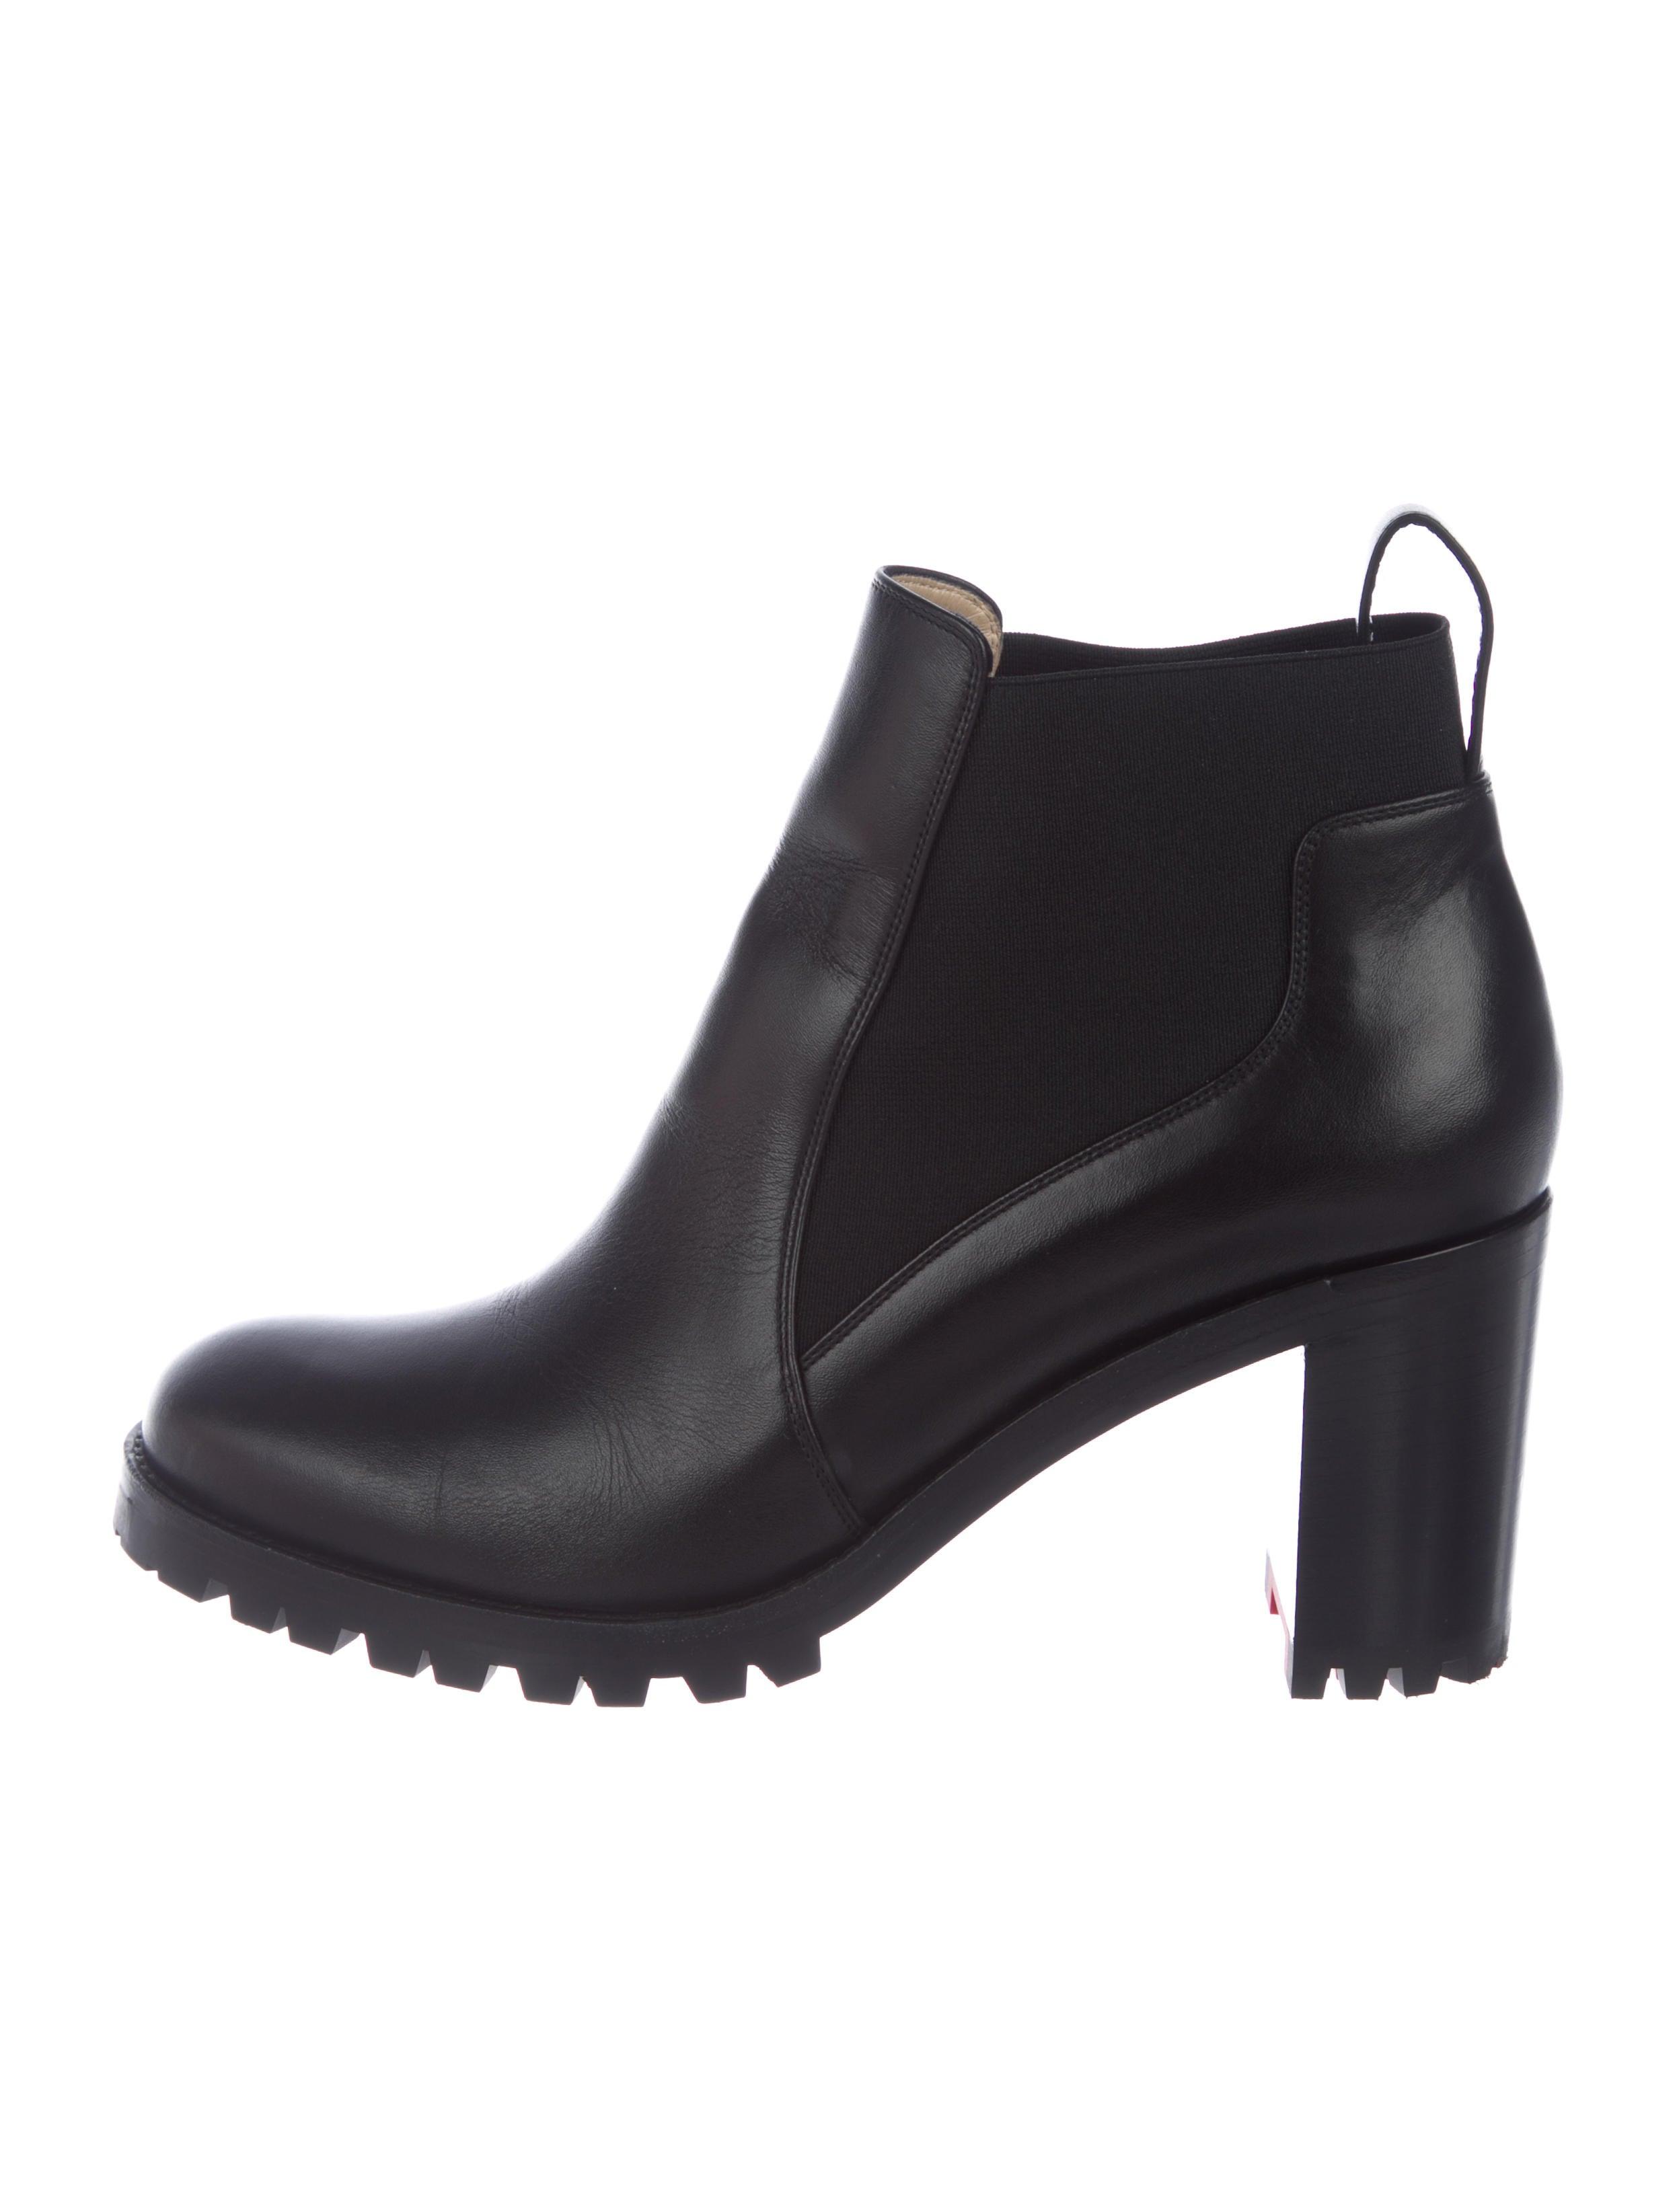 4ec29d185c73 Christian Louboutin Marchacroche 70 Leather Boots - Shoes ...